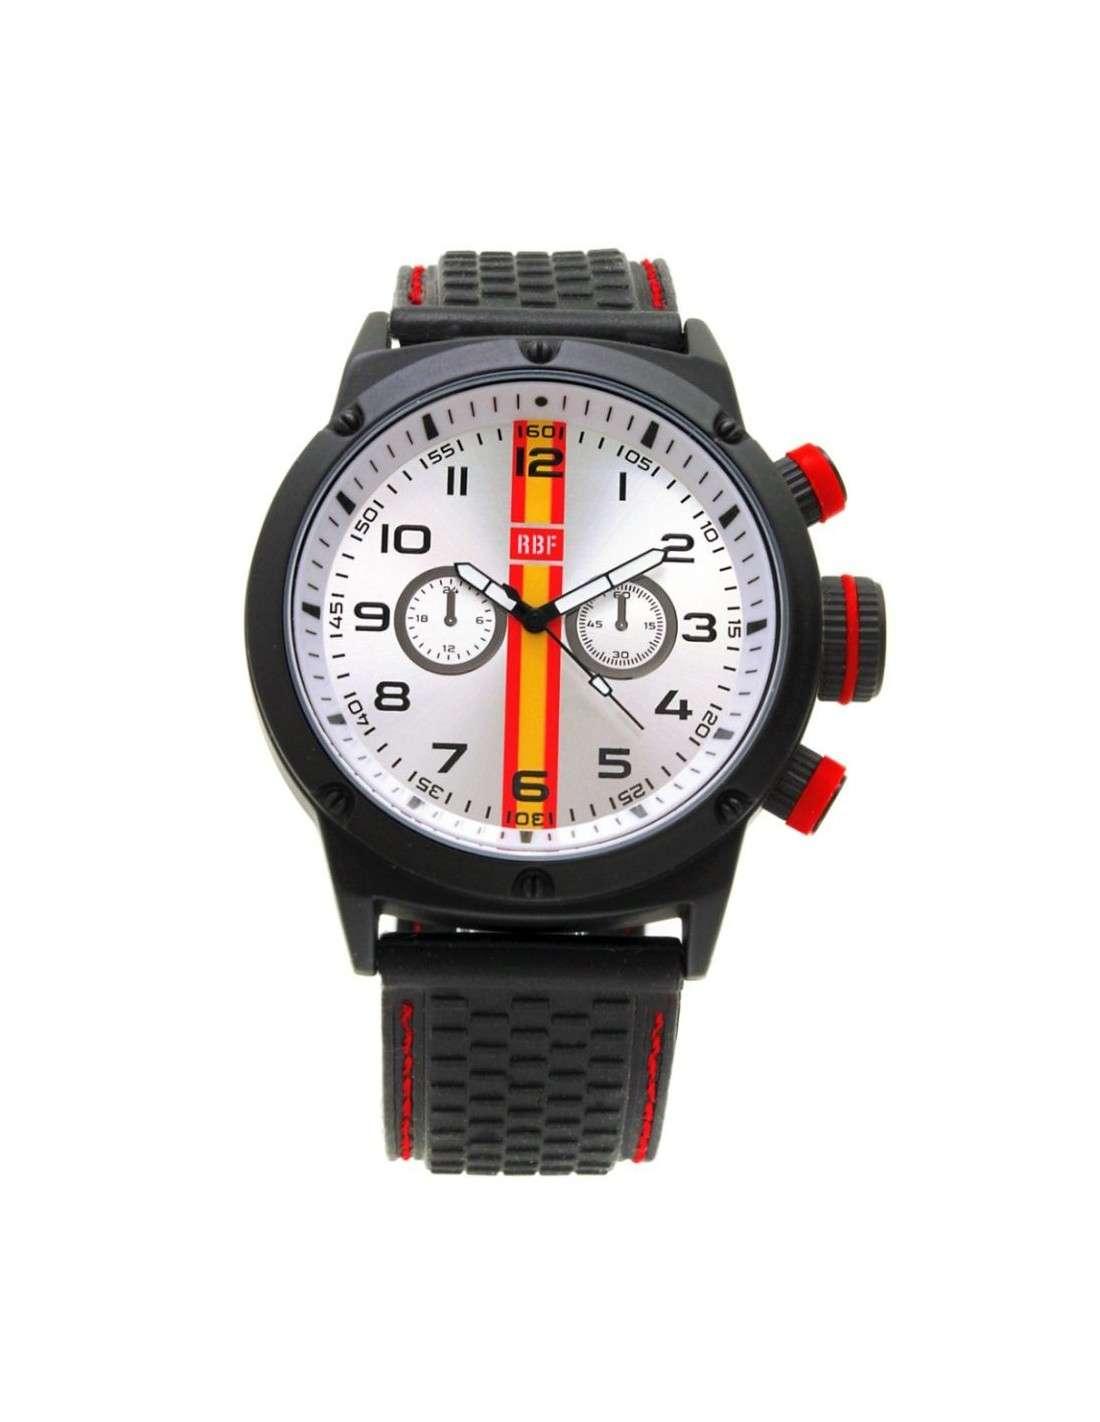 98b4c54334d8 ... Reloj AVIADOR Estilo Crono Rojo Con Bandera de España New RBF-1001 ...